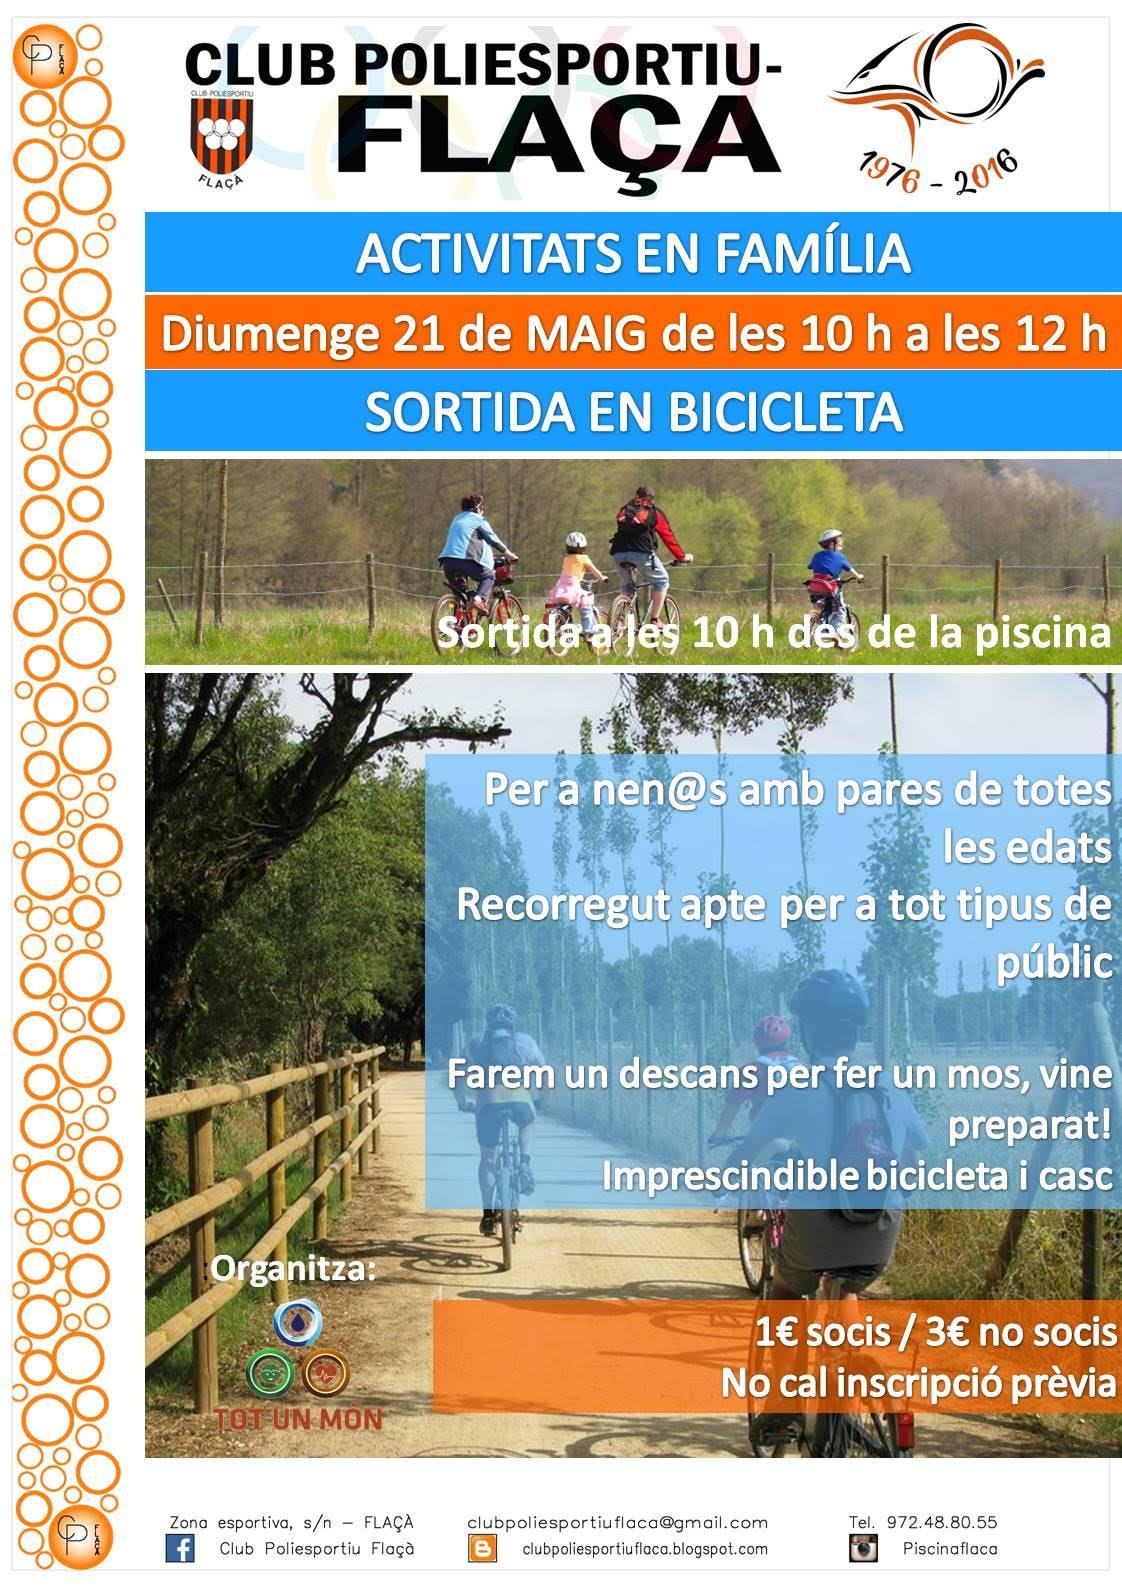 Activitat en #família!